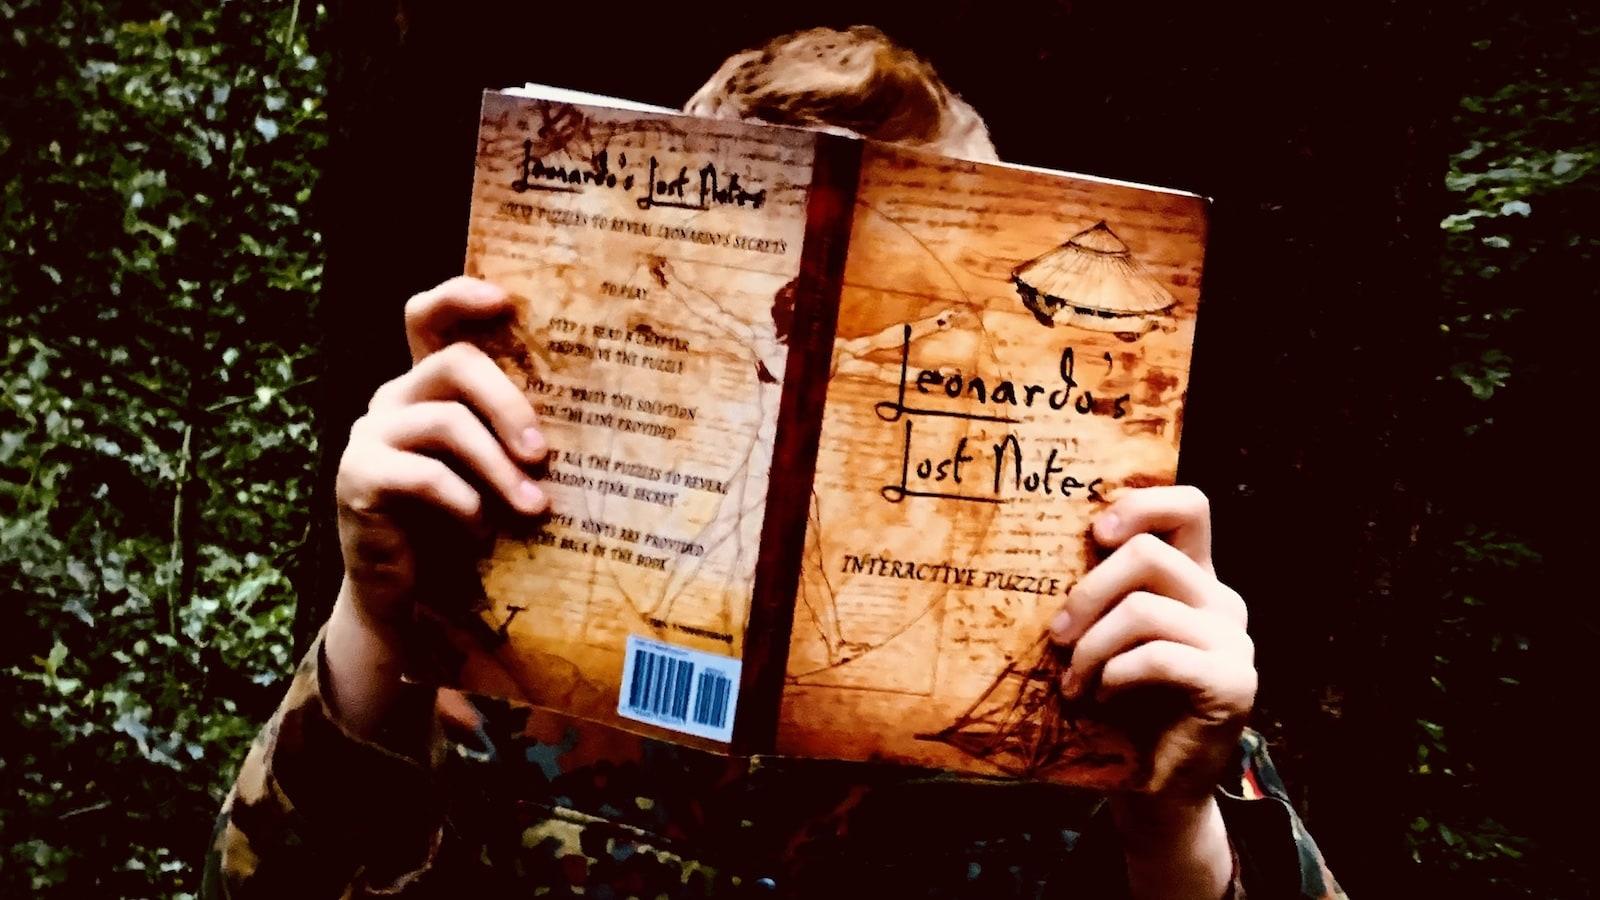 Leonardo's Lost Notes interactive puzzle book features sketches from Leonardo da Vinci